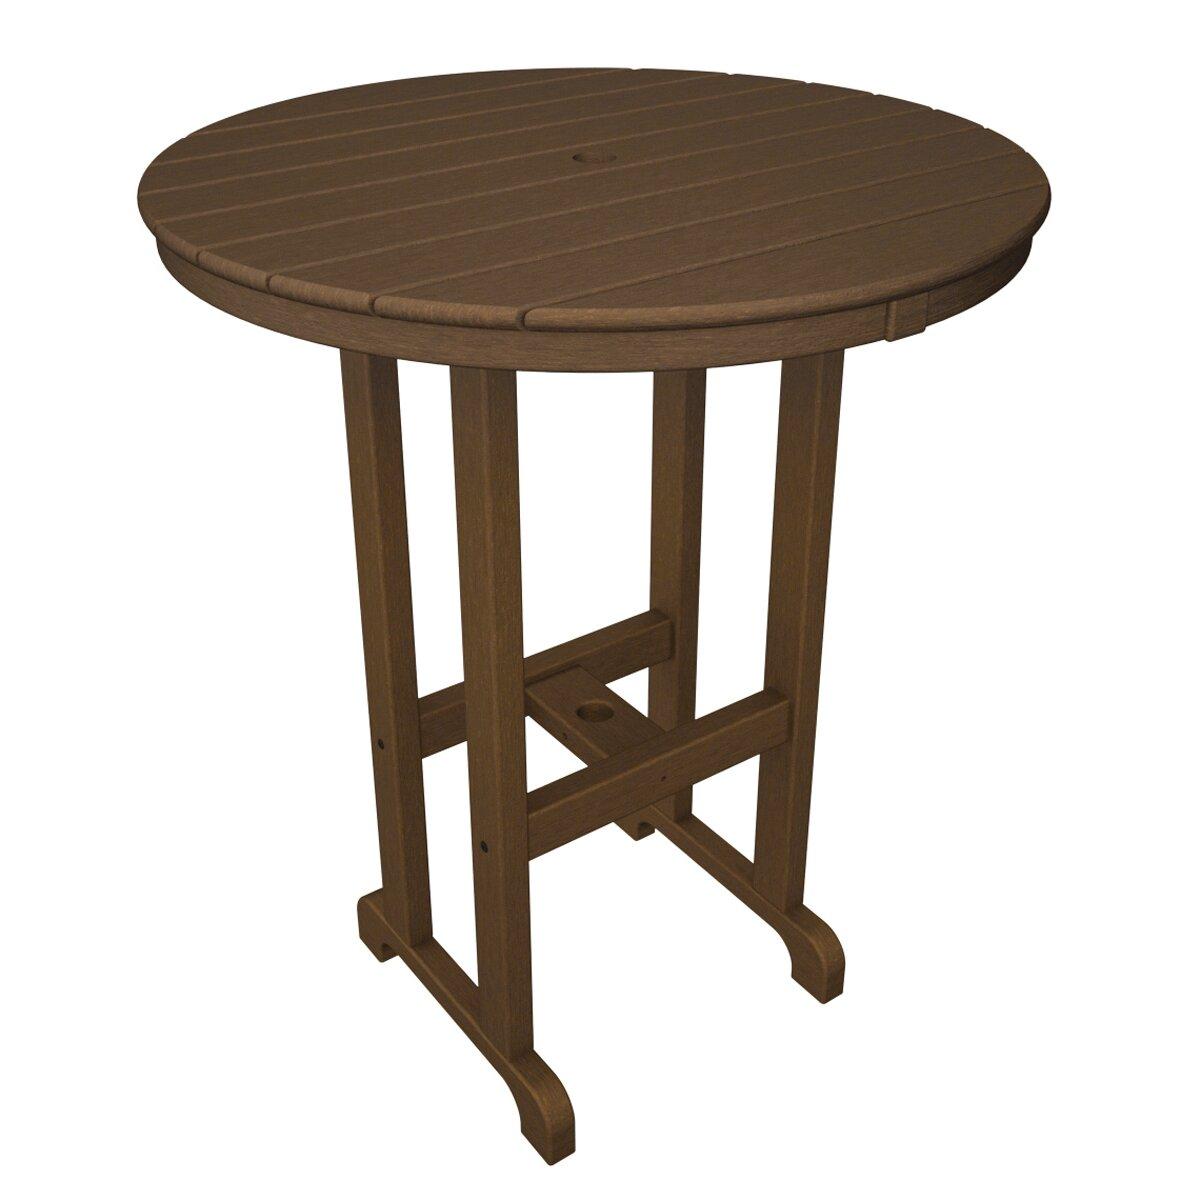 Polywood Round Outdoor Bar Table Reviews Wayfair